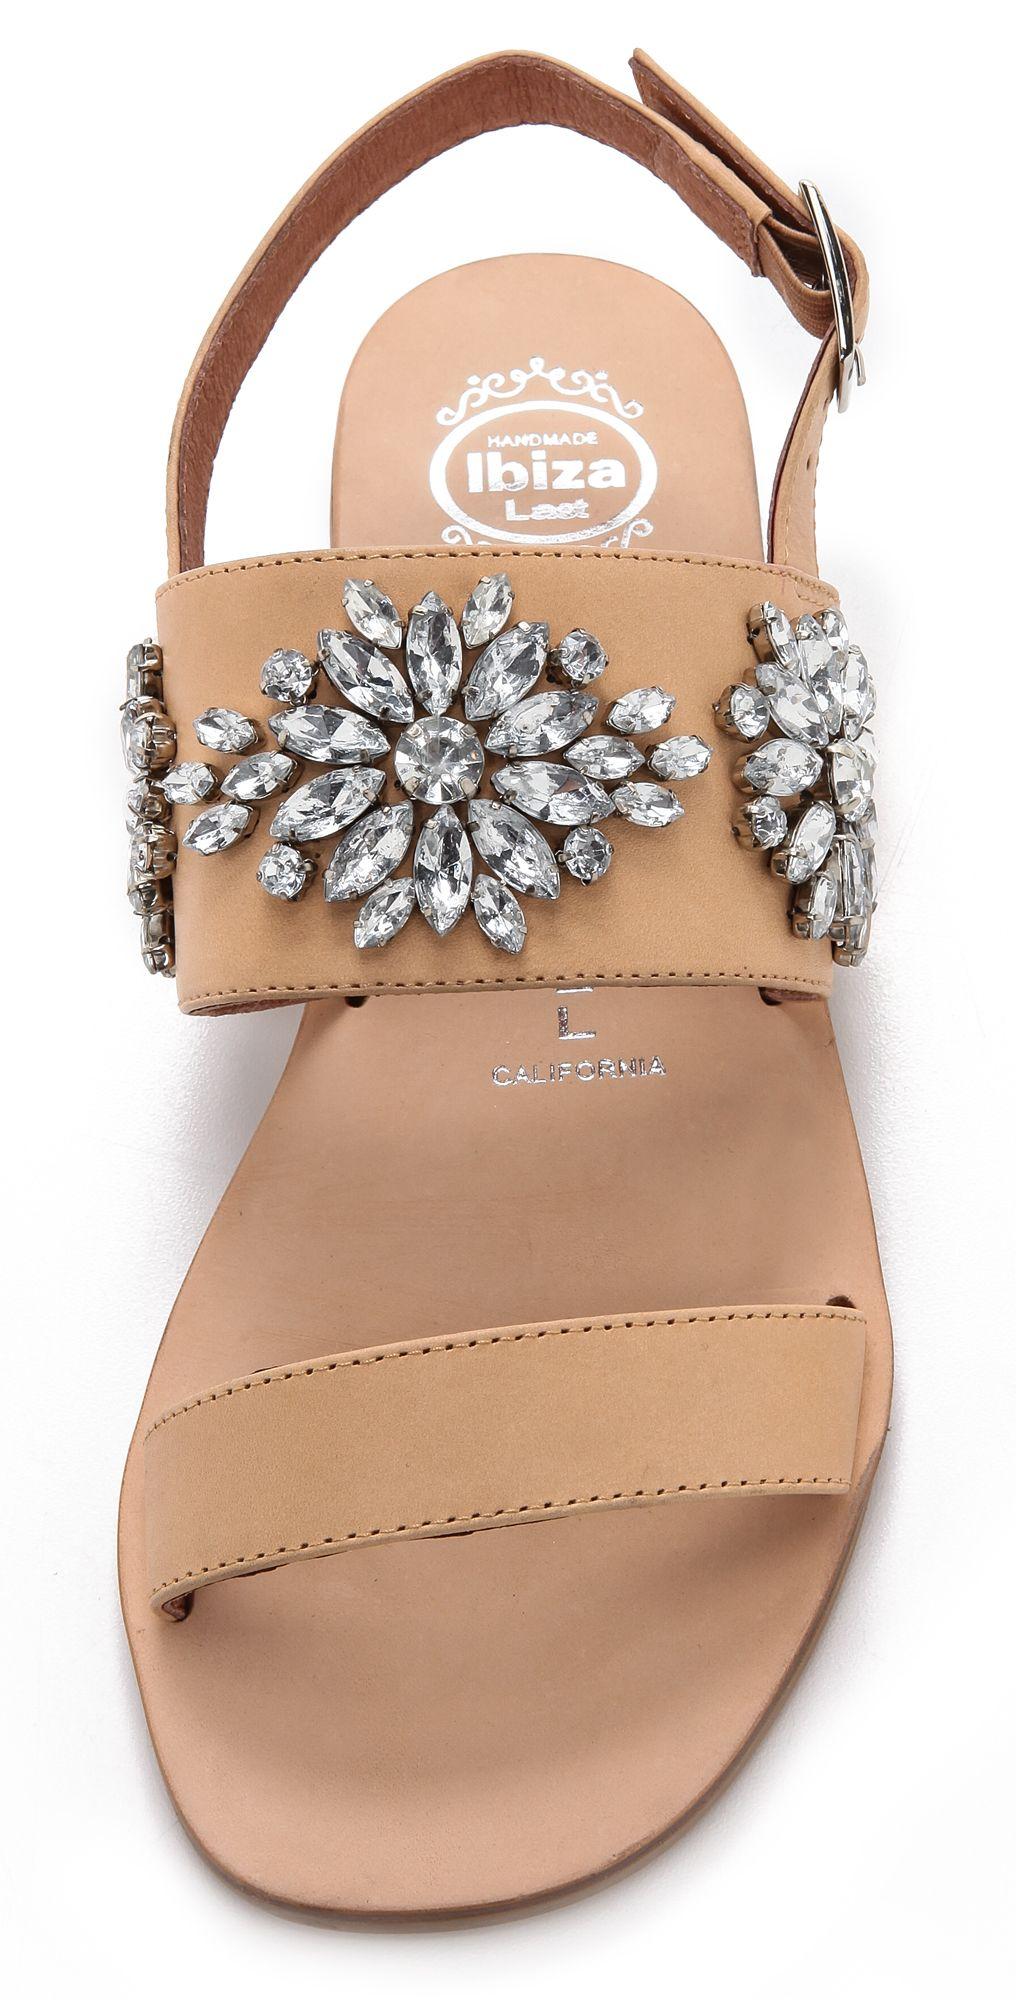 b491f19b93e59 Jeffrey Campbell Dola Jeweled Sandals